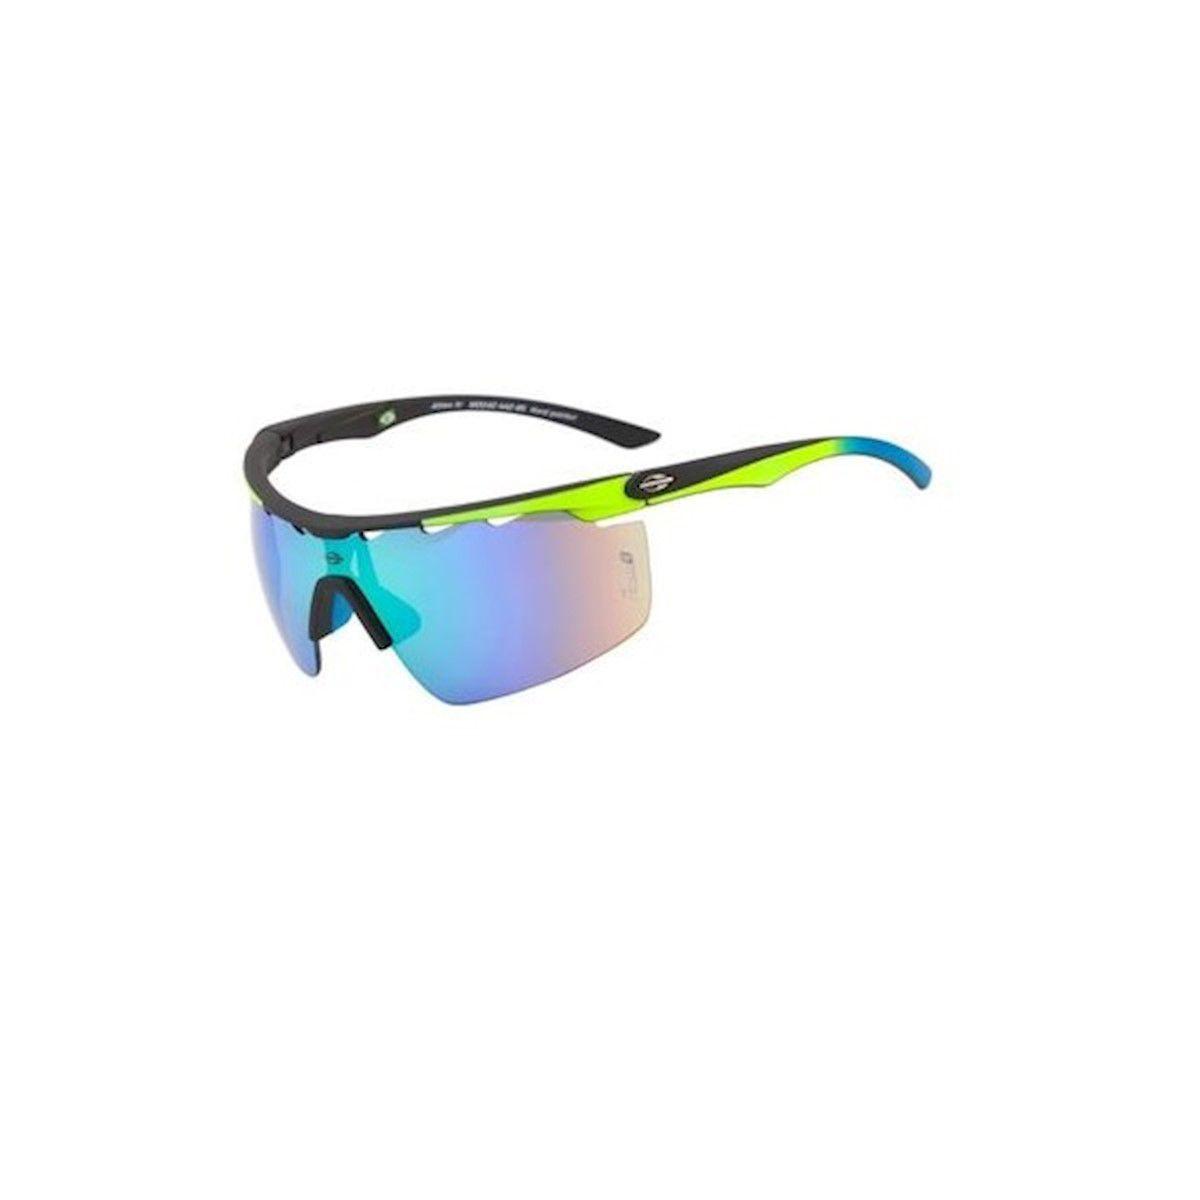 Oculos de Sol Mormaii Athlon 4 Amarelo/Limão